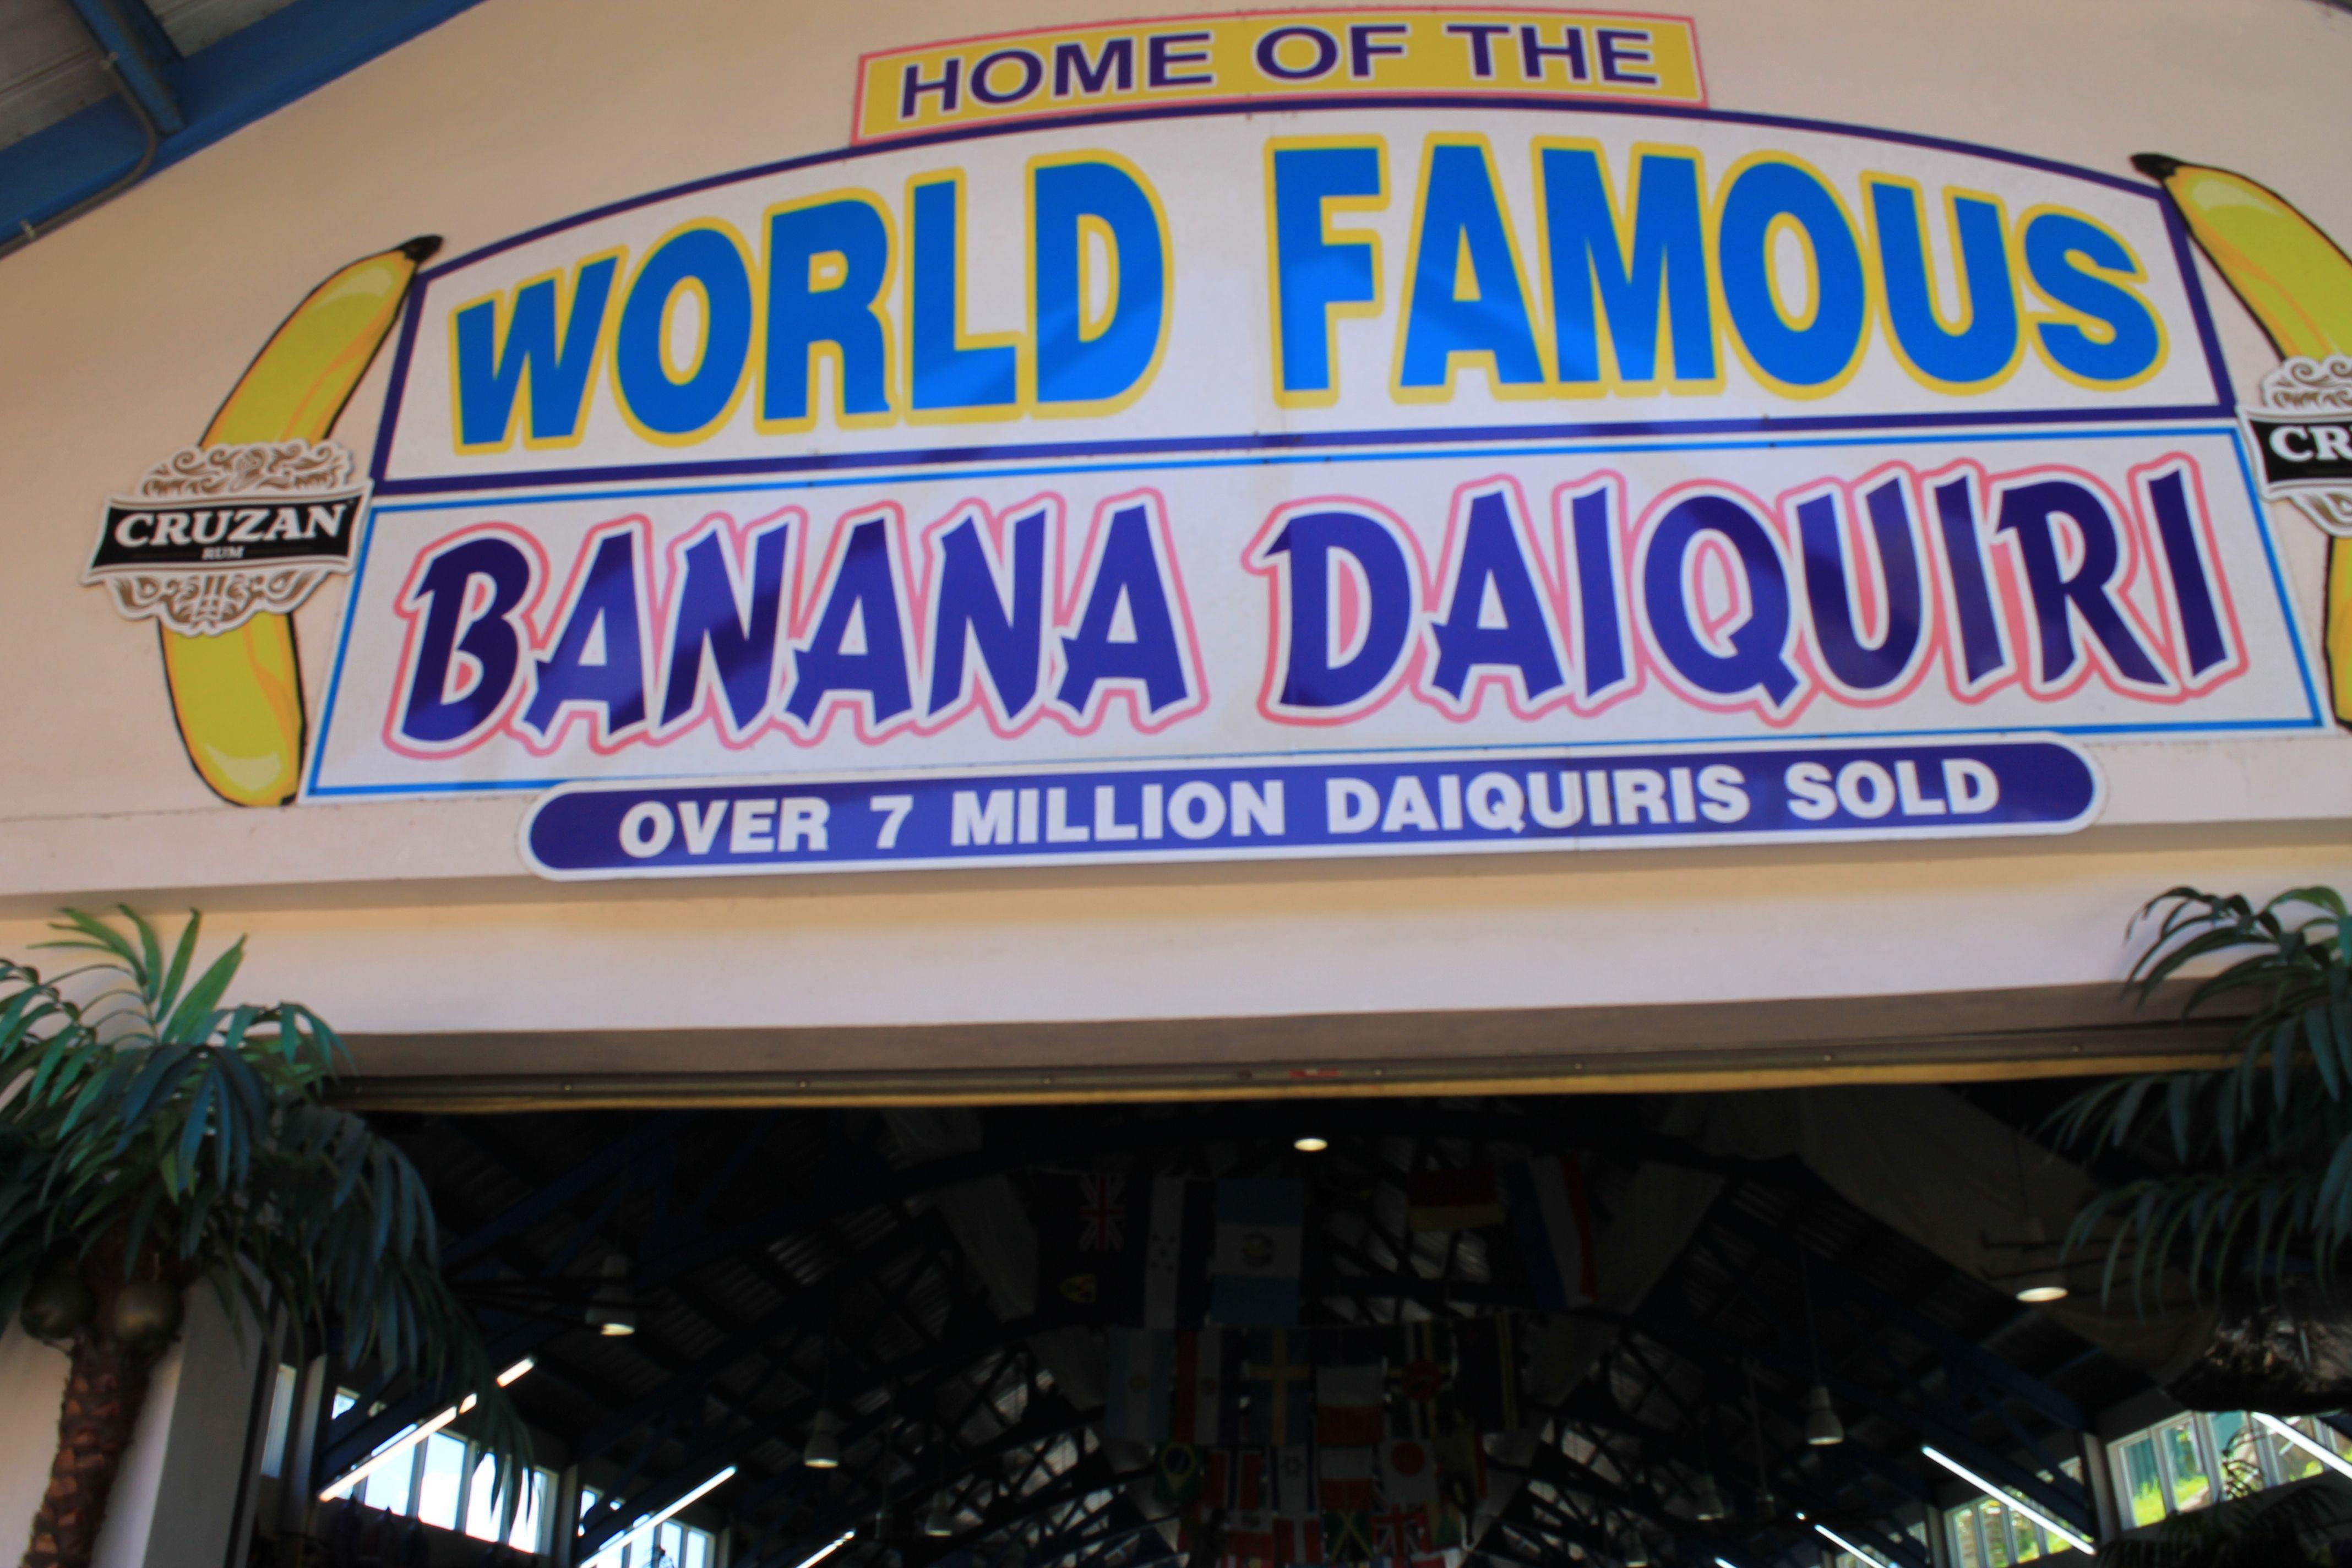 Tour of the Banana Daiquiri Find this